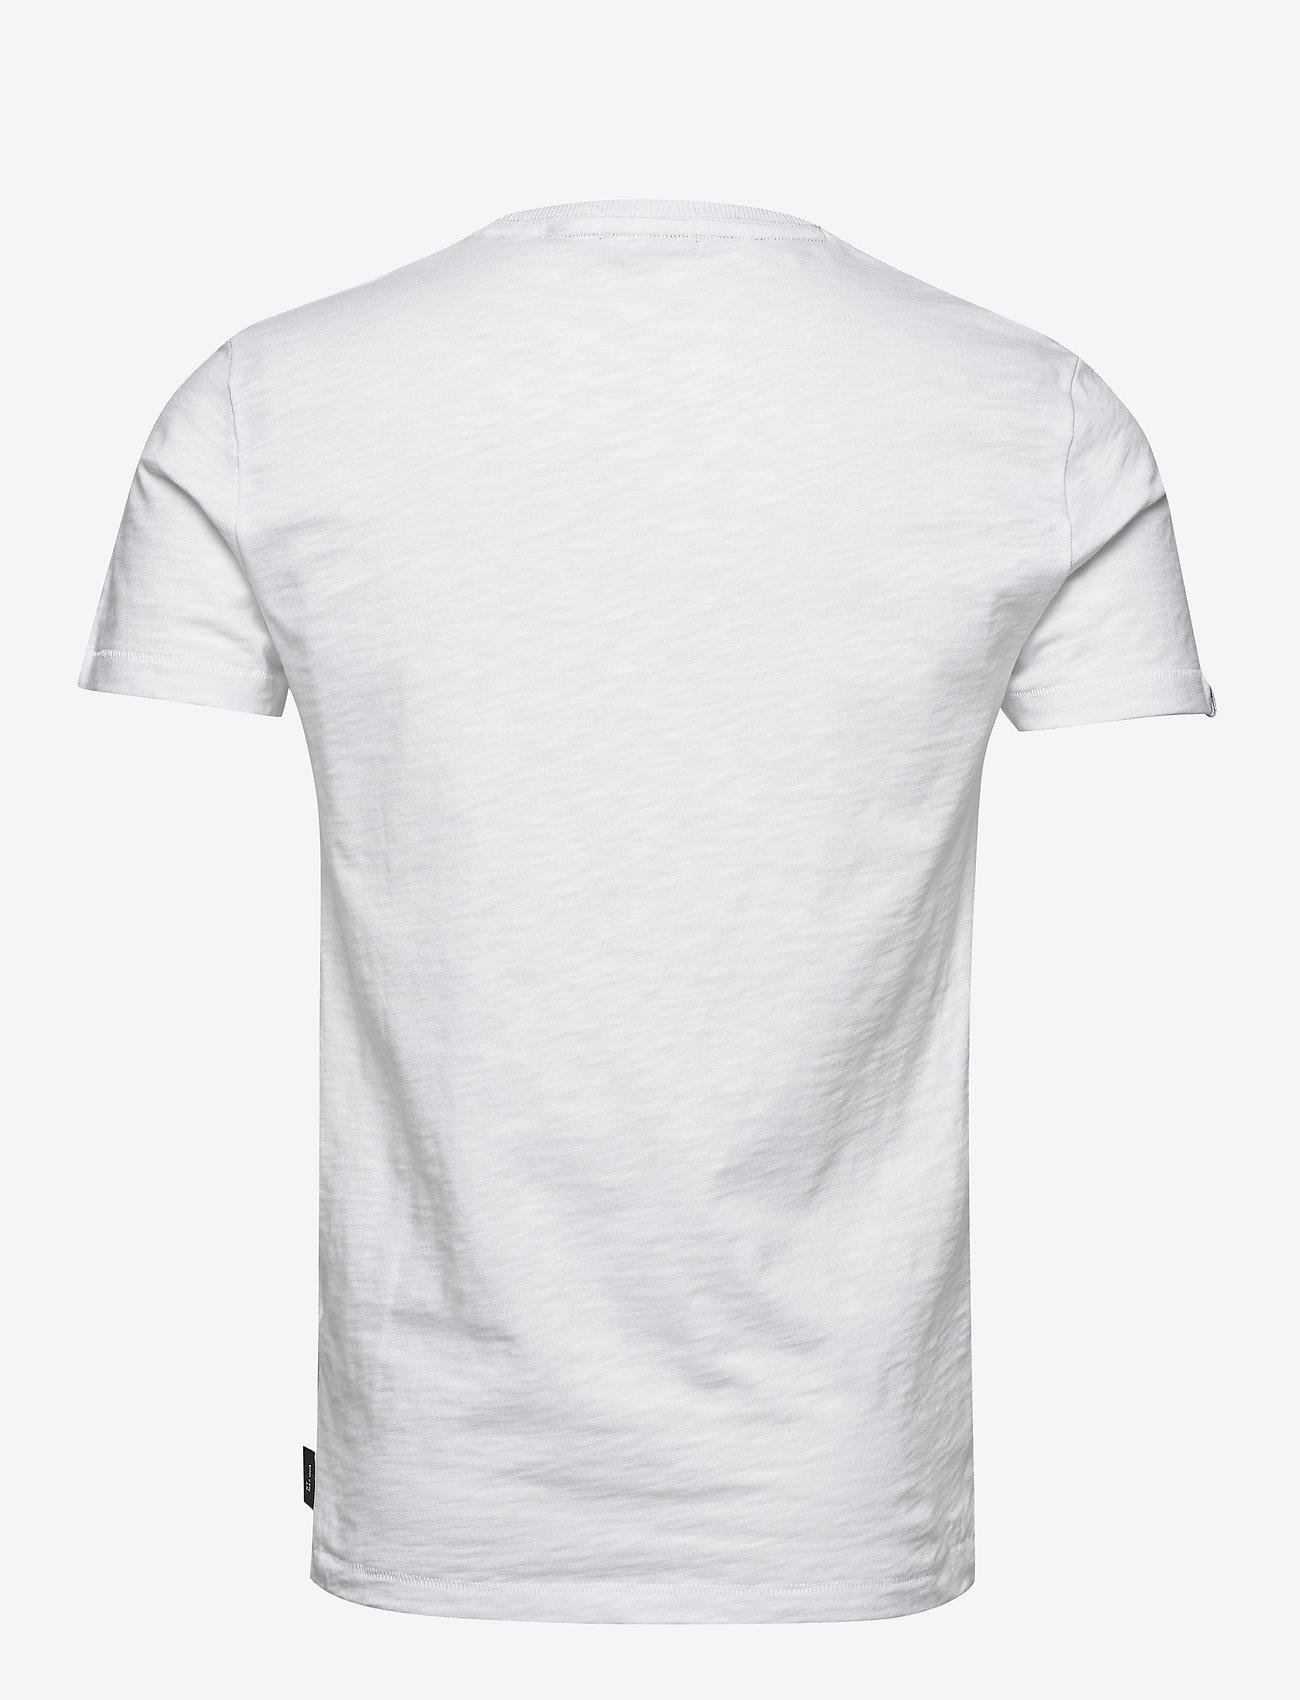 Superdry Surplus Goods Classic Graphic Tee - T-shirts Optic Slub